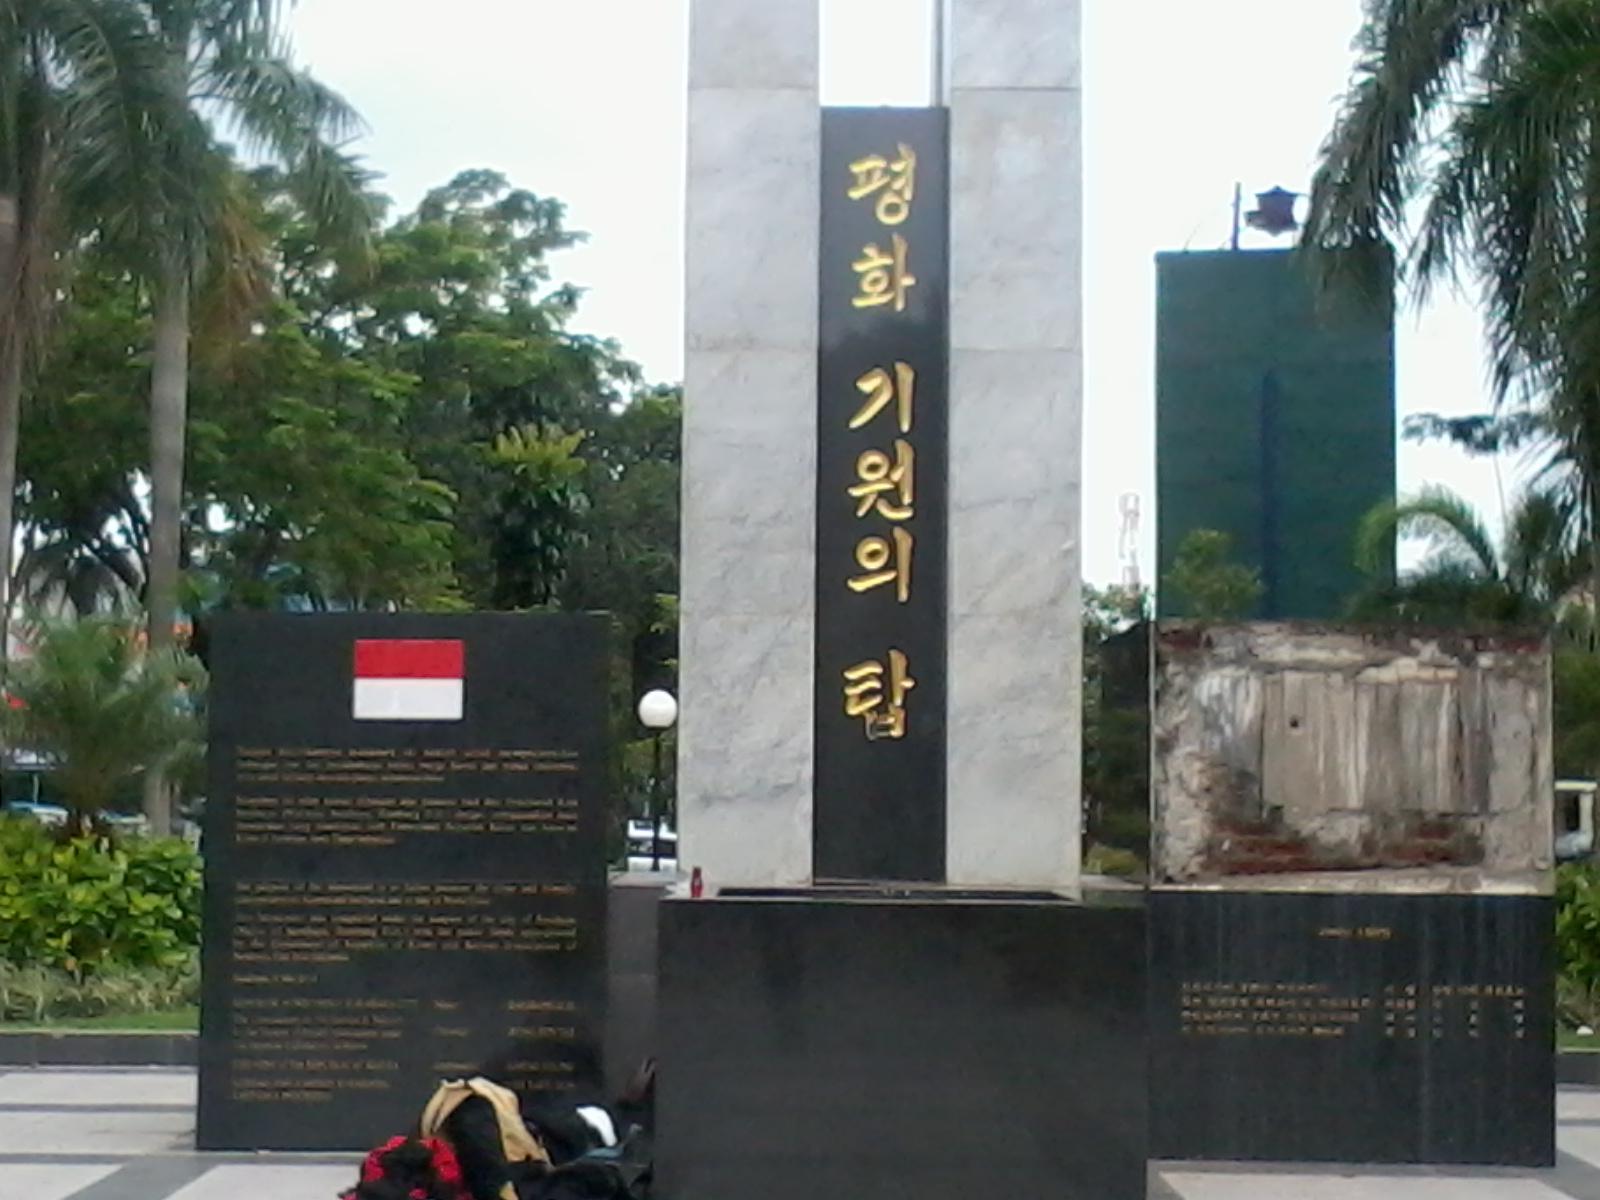 Intaps Reading Club Keindahan Korea Ala Surabaya Berkunjung Taman Persahabatan